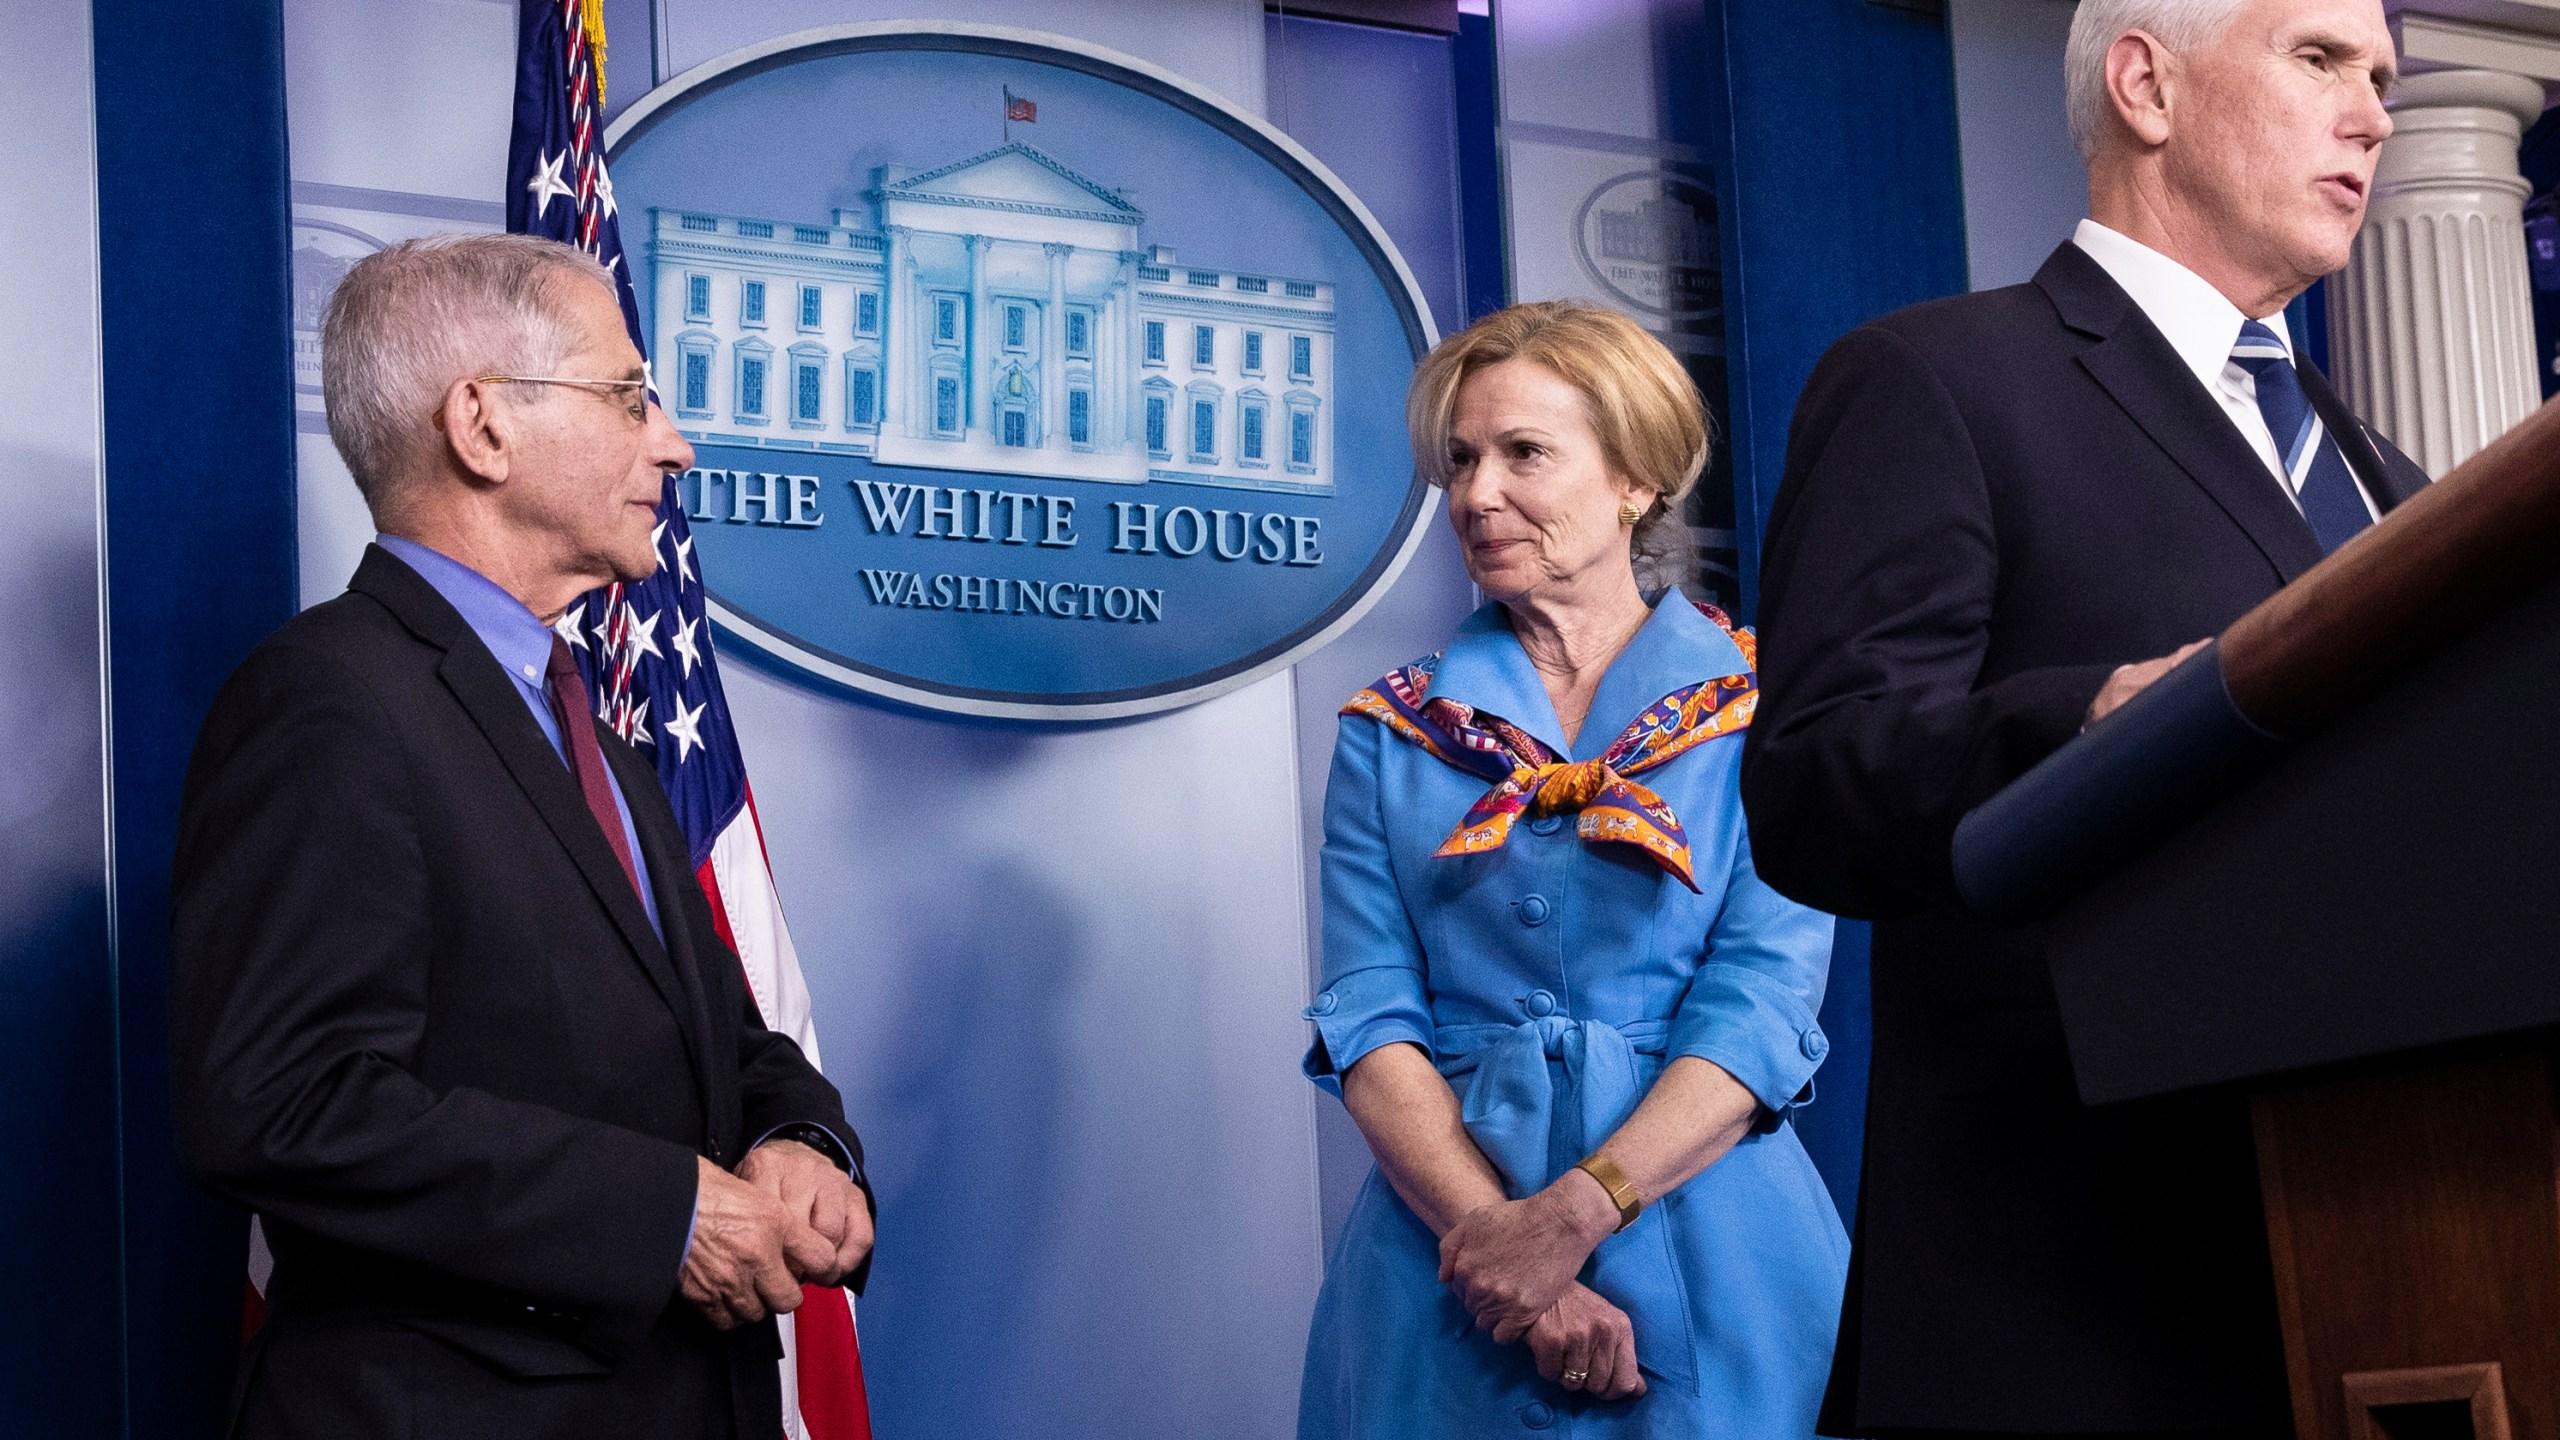 Drs. Fauci and Birx to continue advising Trump on coronavirus